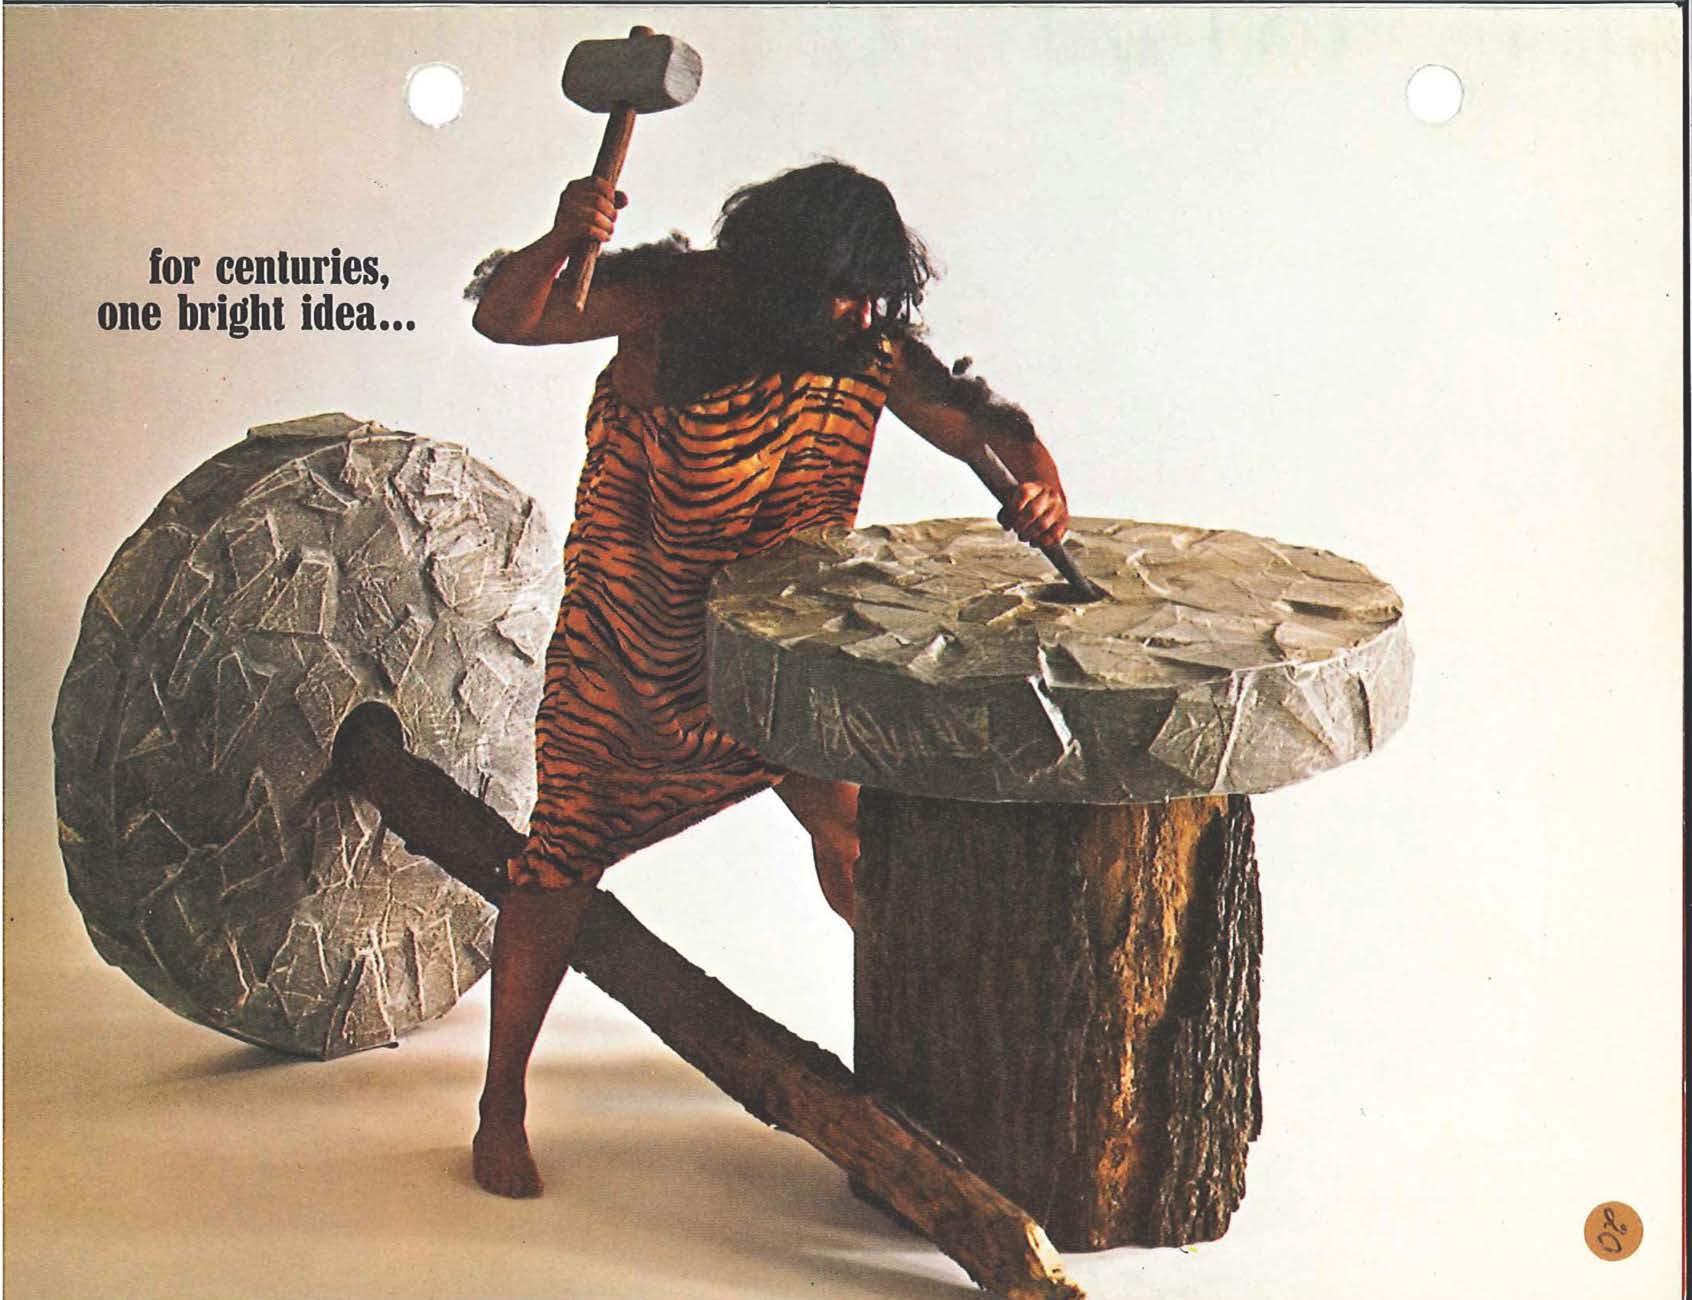 Caveman Style : Flashback friday caveman style « the washfountain